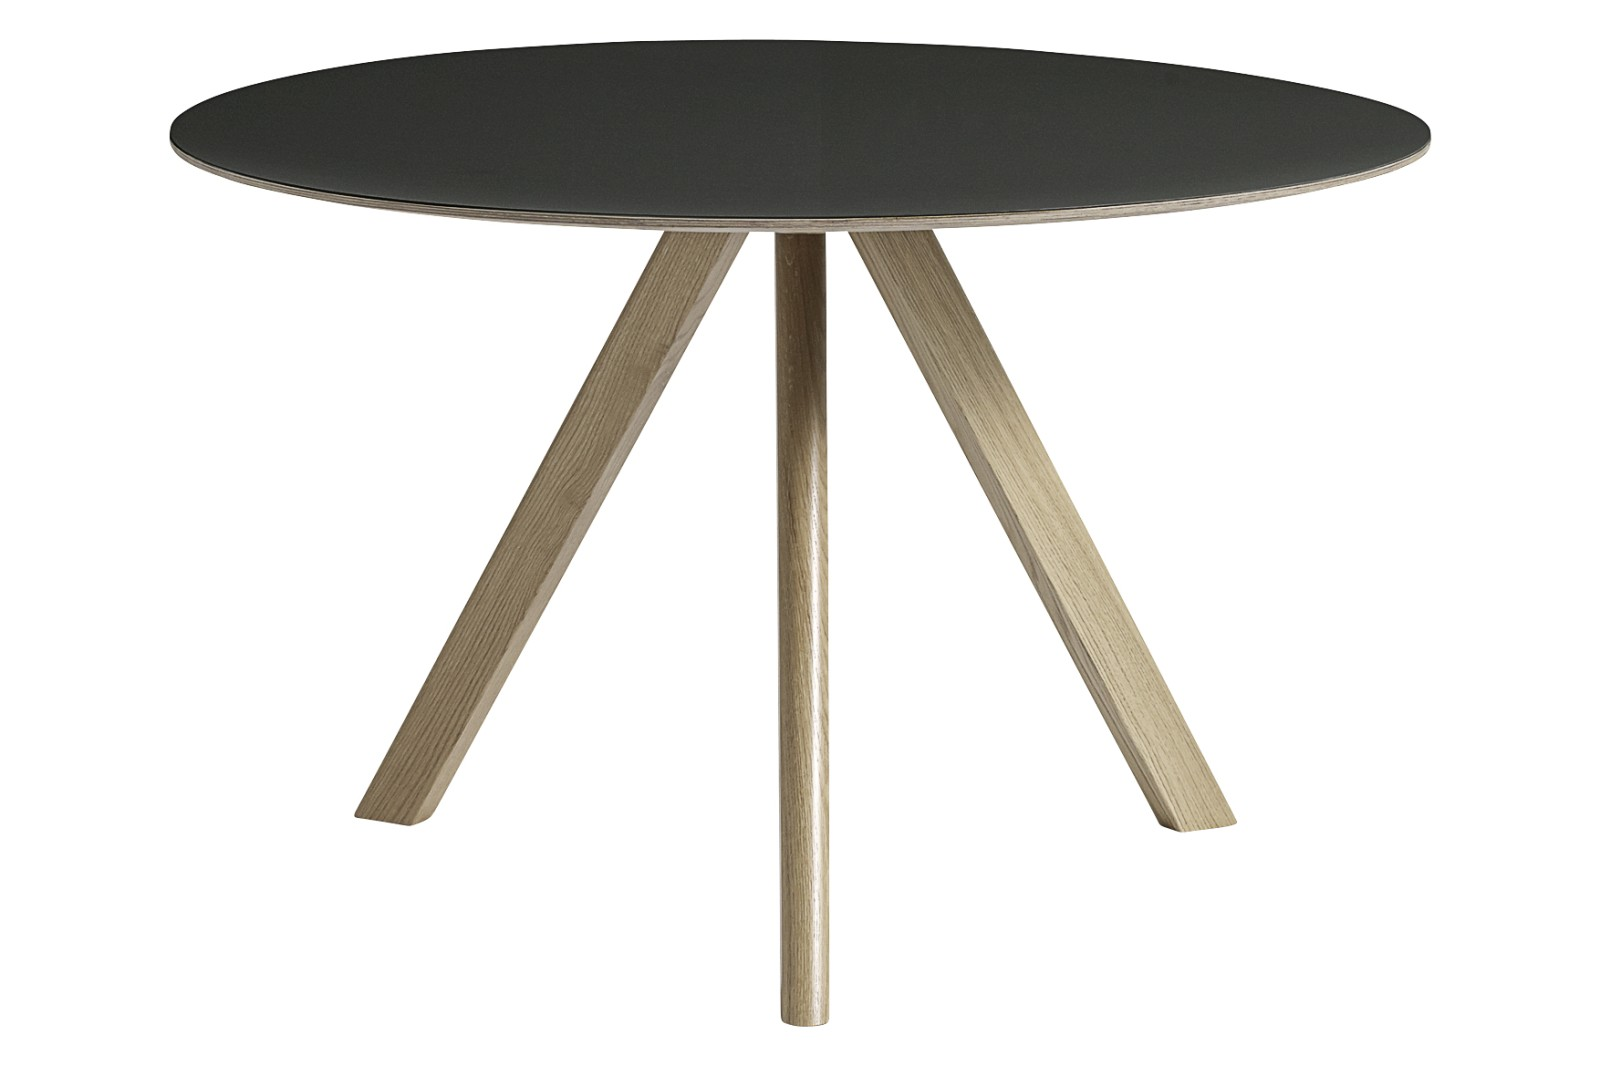 CPH 20 Round Dining Table Linoleum Black / Wood Soaped Oak, 120cm